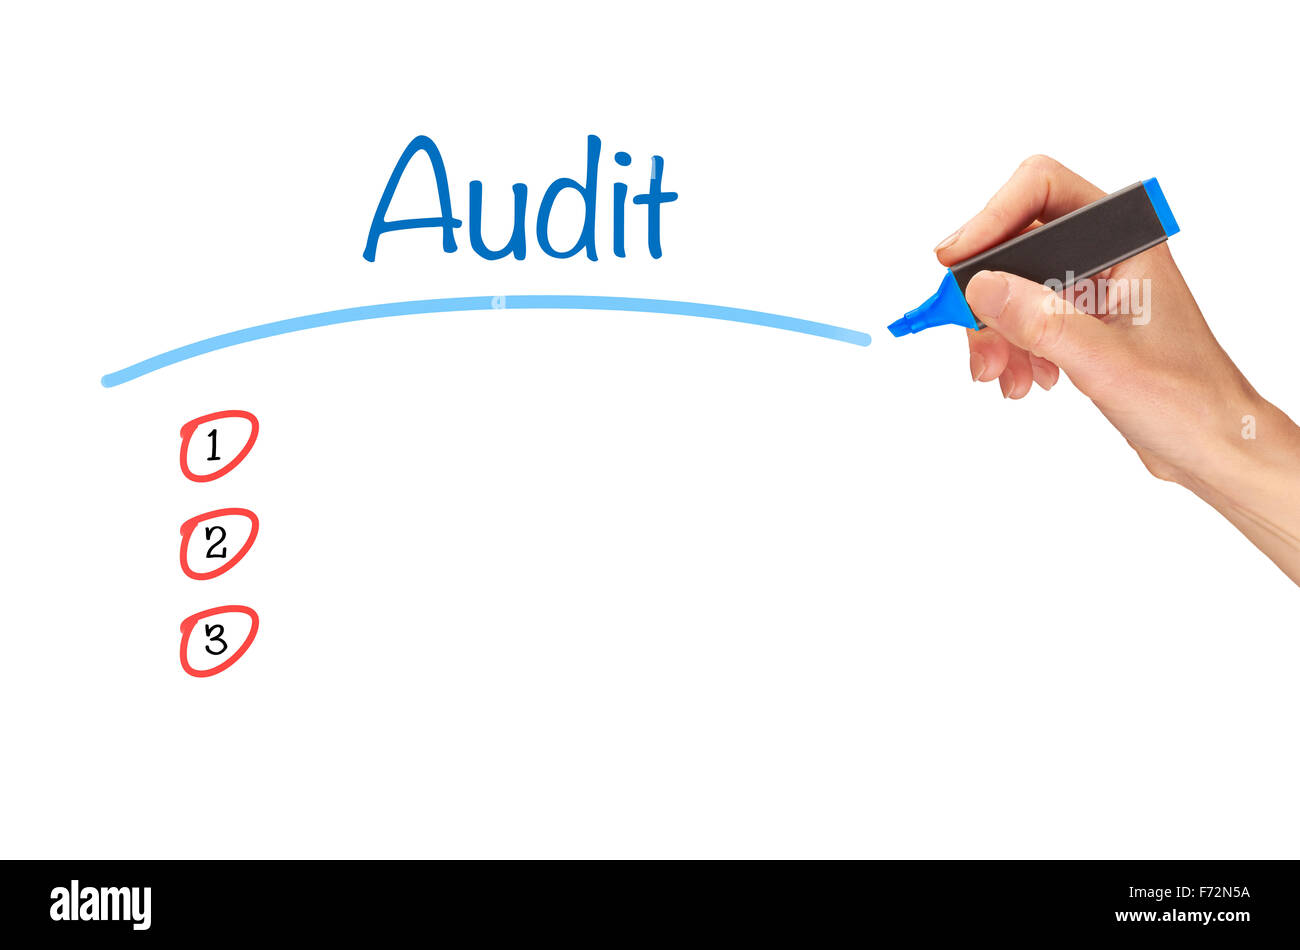 Audit, written in marker on a clear screen. - Stock Image